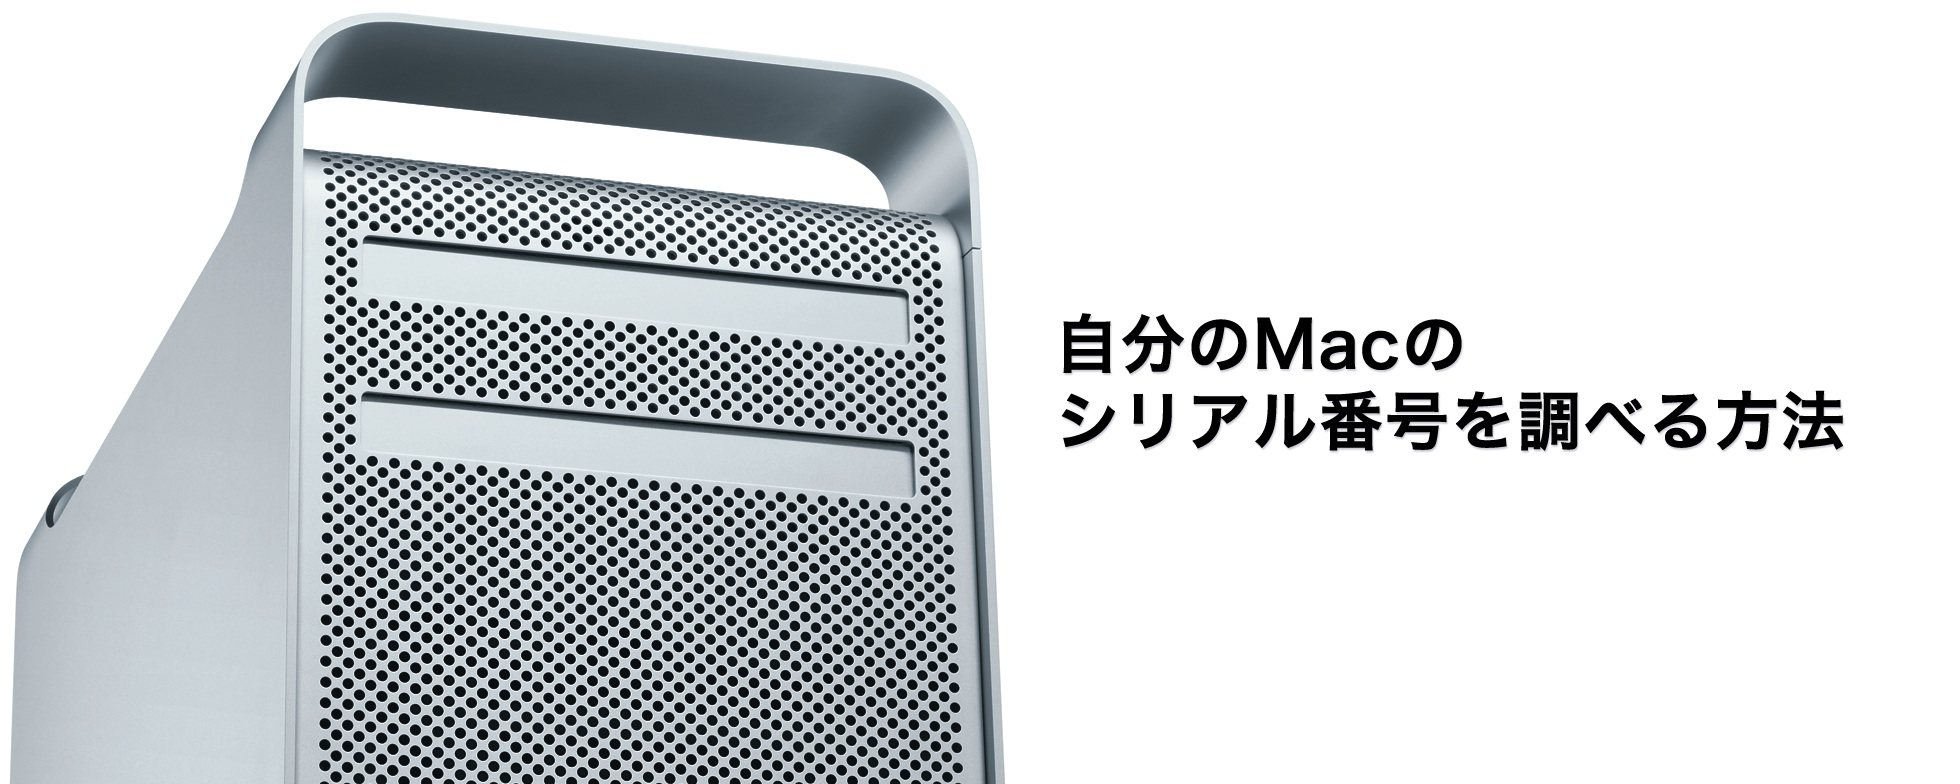 Mac | シリアル番号の調べ方 (Macユーザー向け)